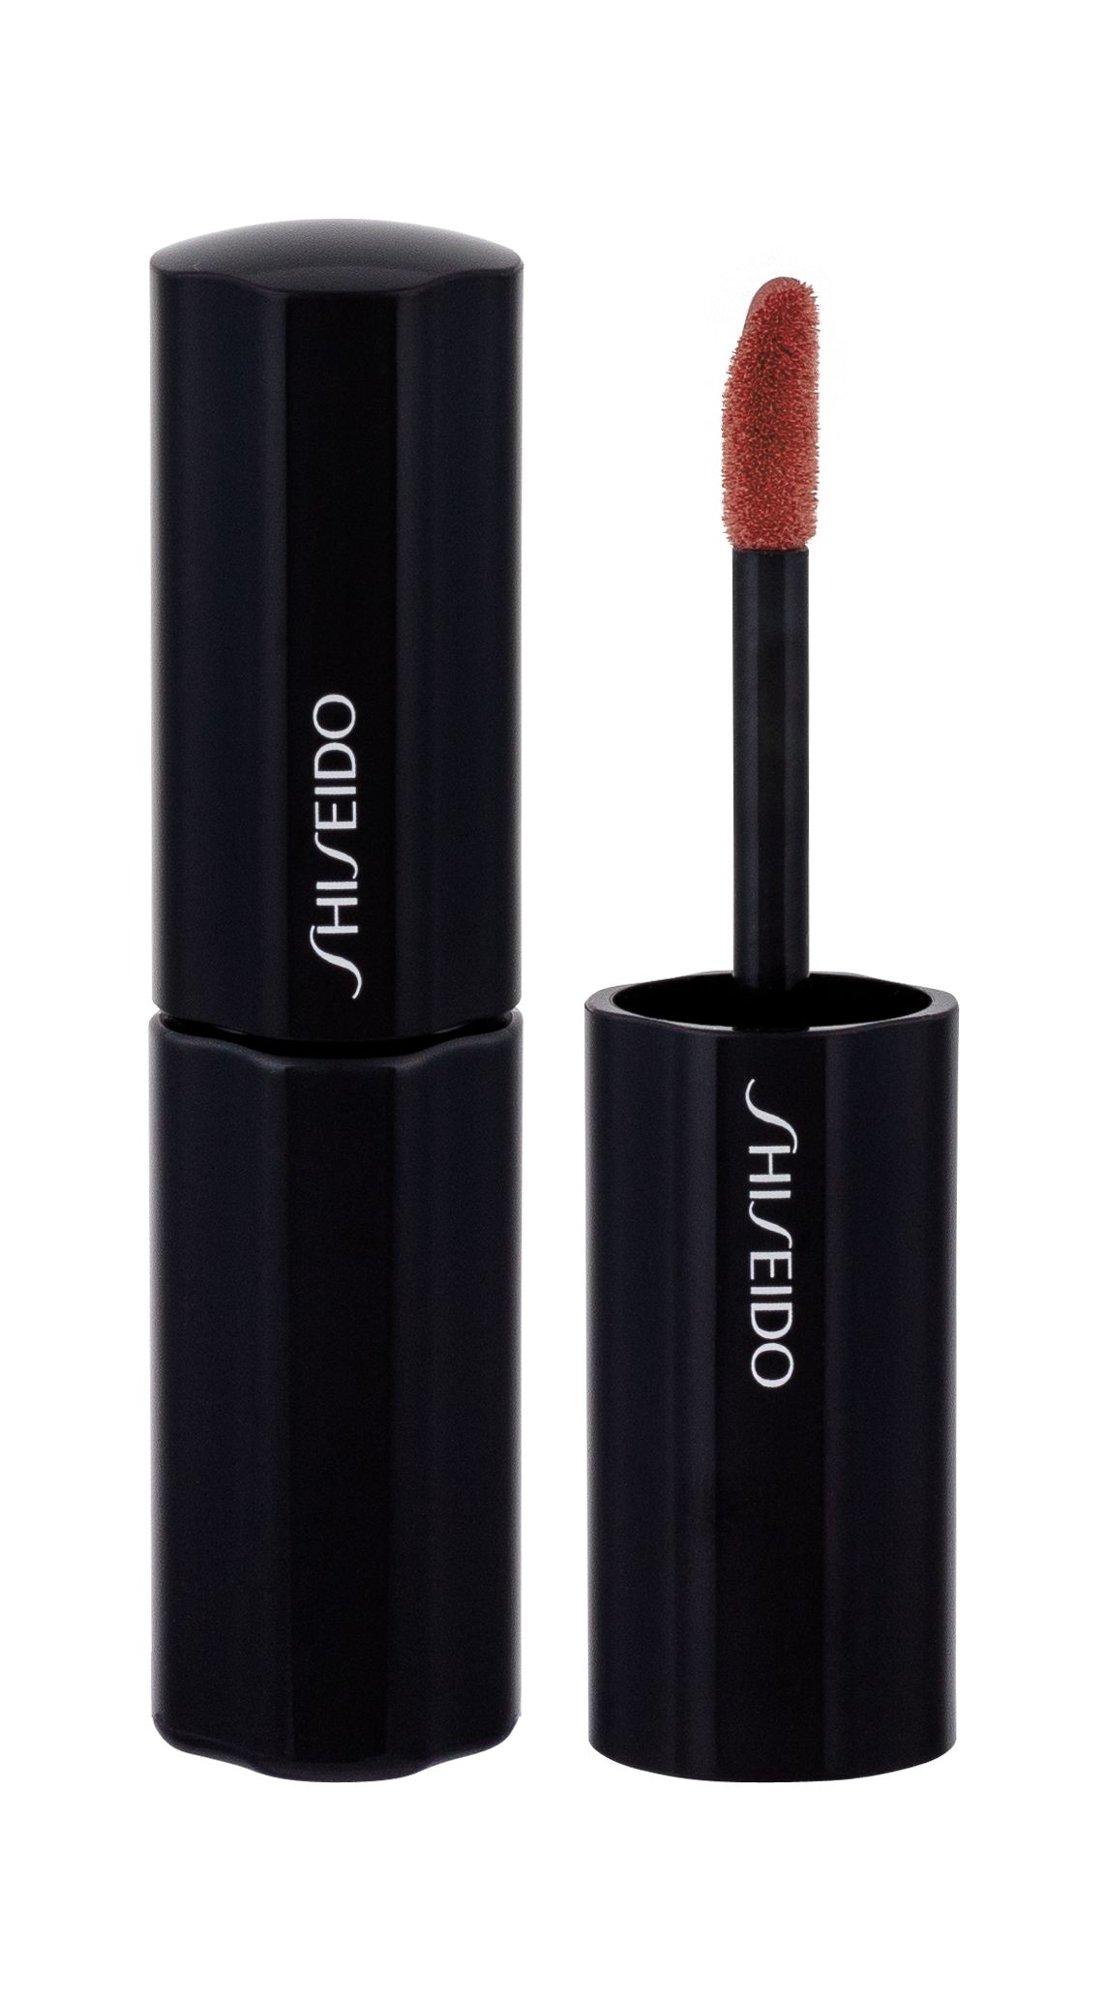 Shiseido Lacquer Rouge Lipstick 6ml RD702